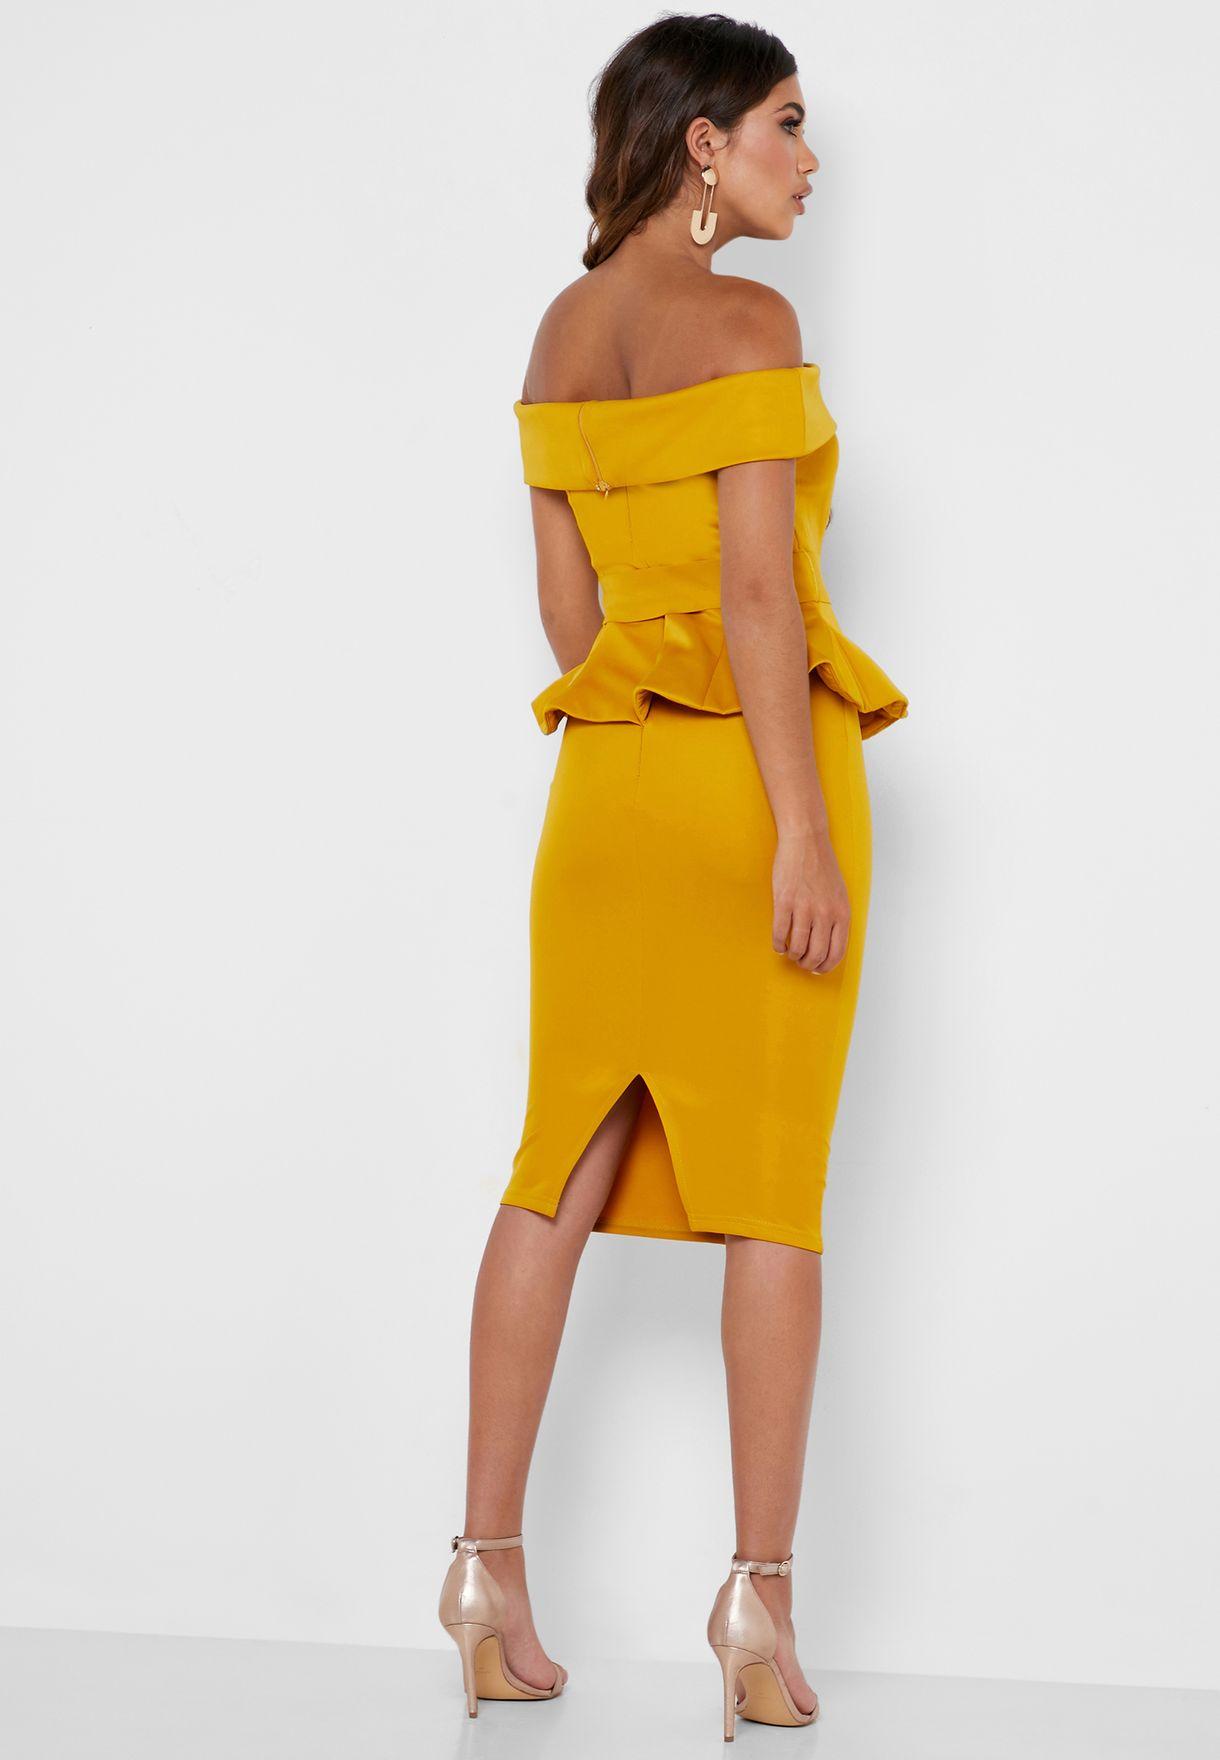 Ruffle Detail Peplum Bardot Dress